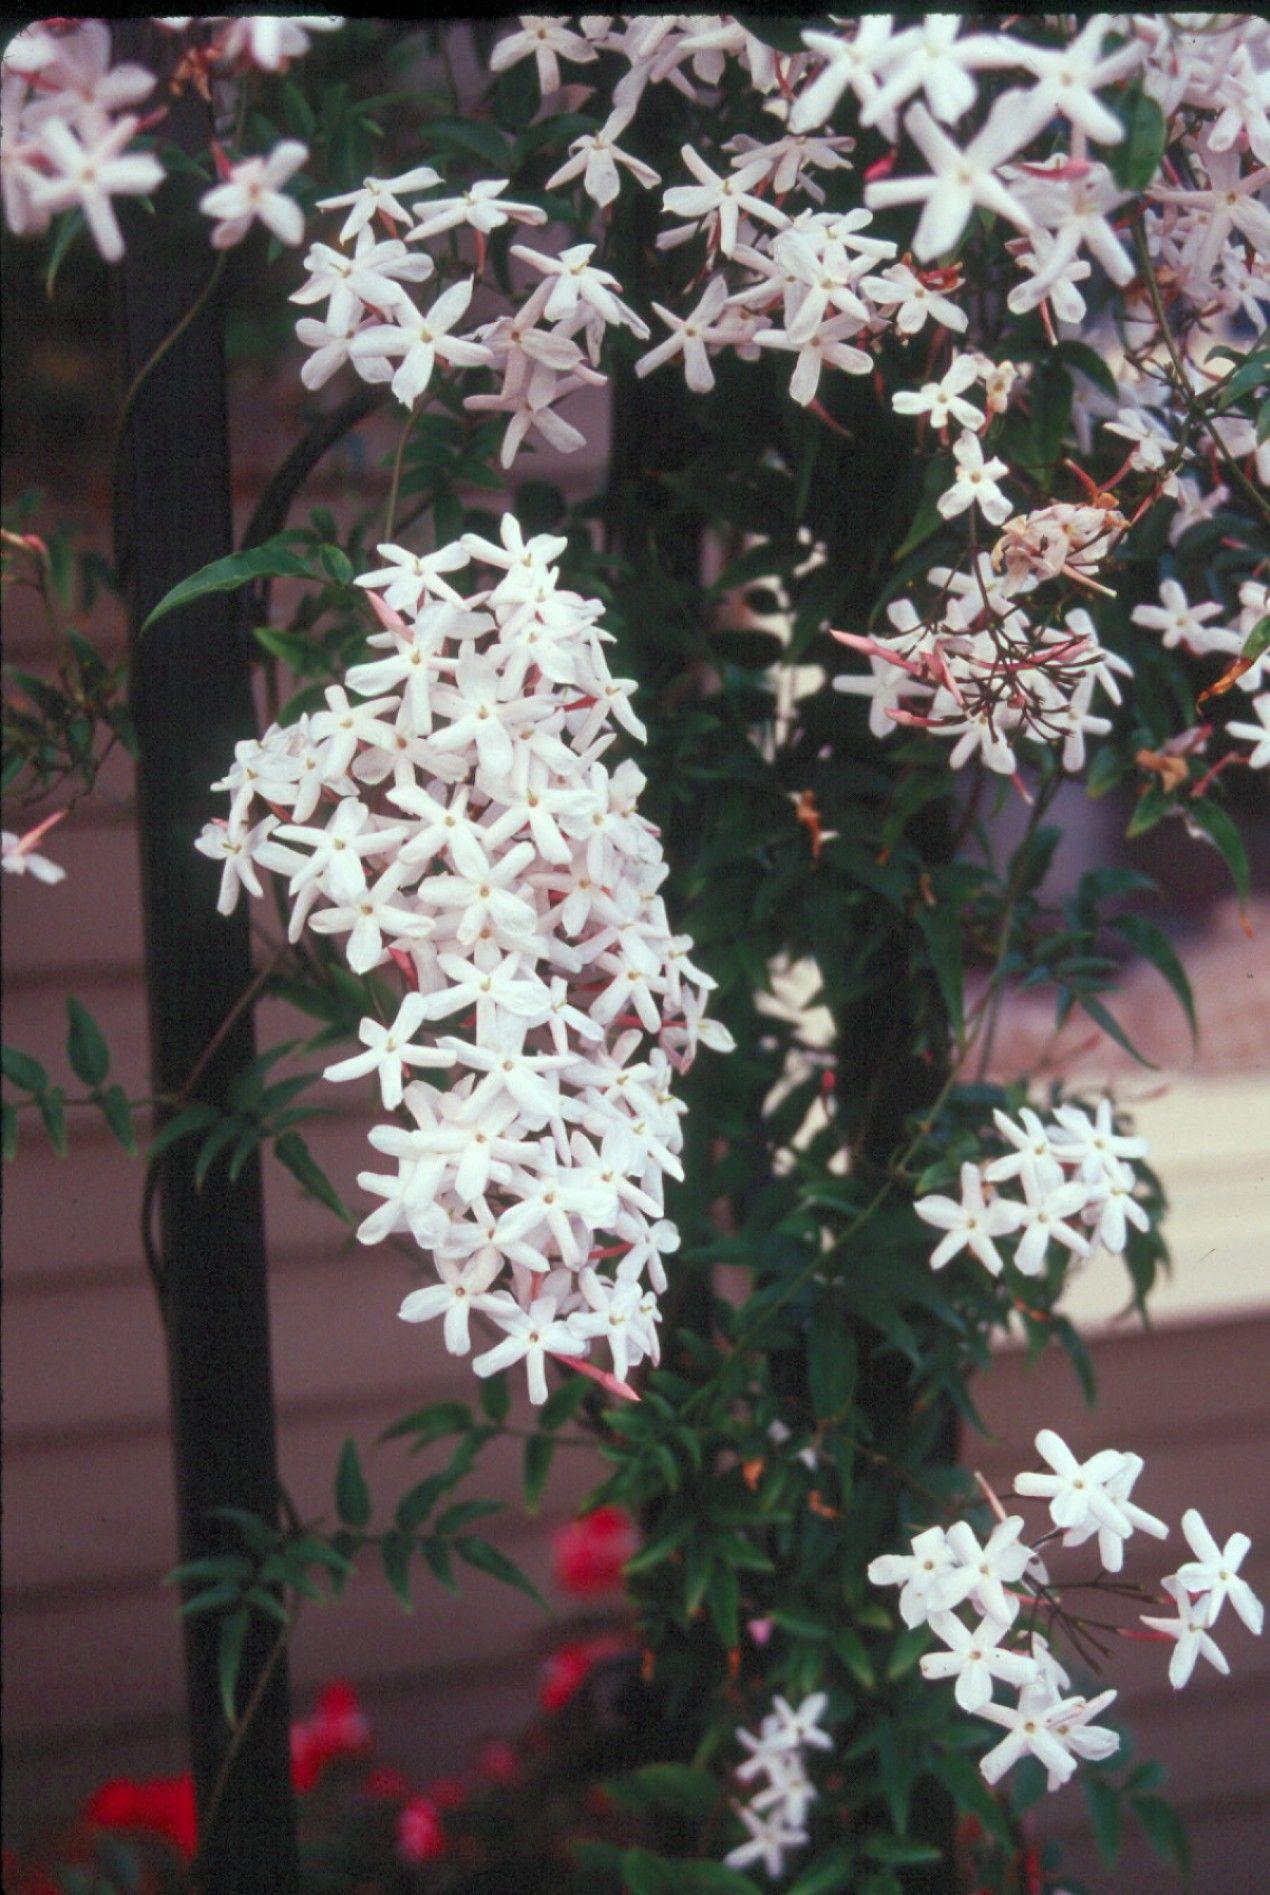 Climbing Vine Trellis Ideas Part - 47: Jasminum Polyanthum Very Fragrant Vine For Climbing The Wall/trellis